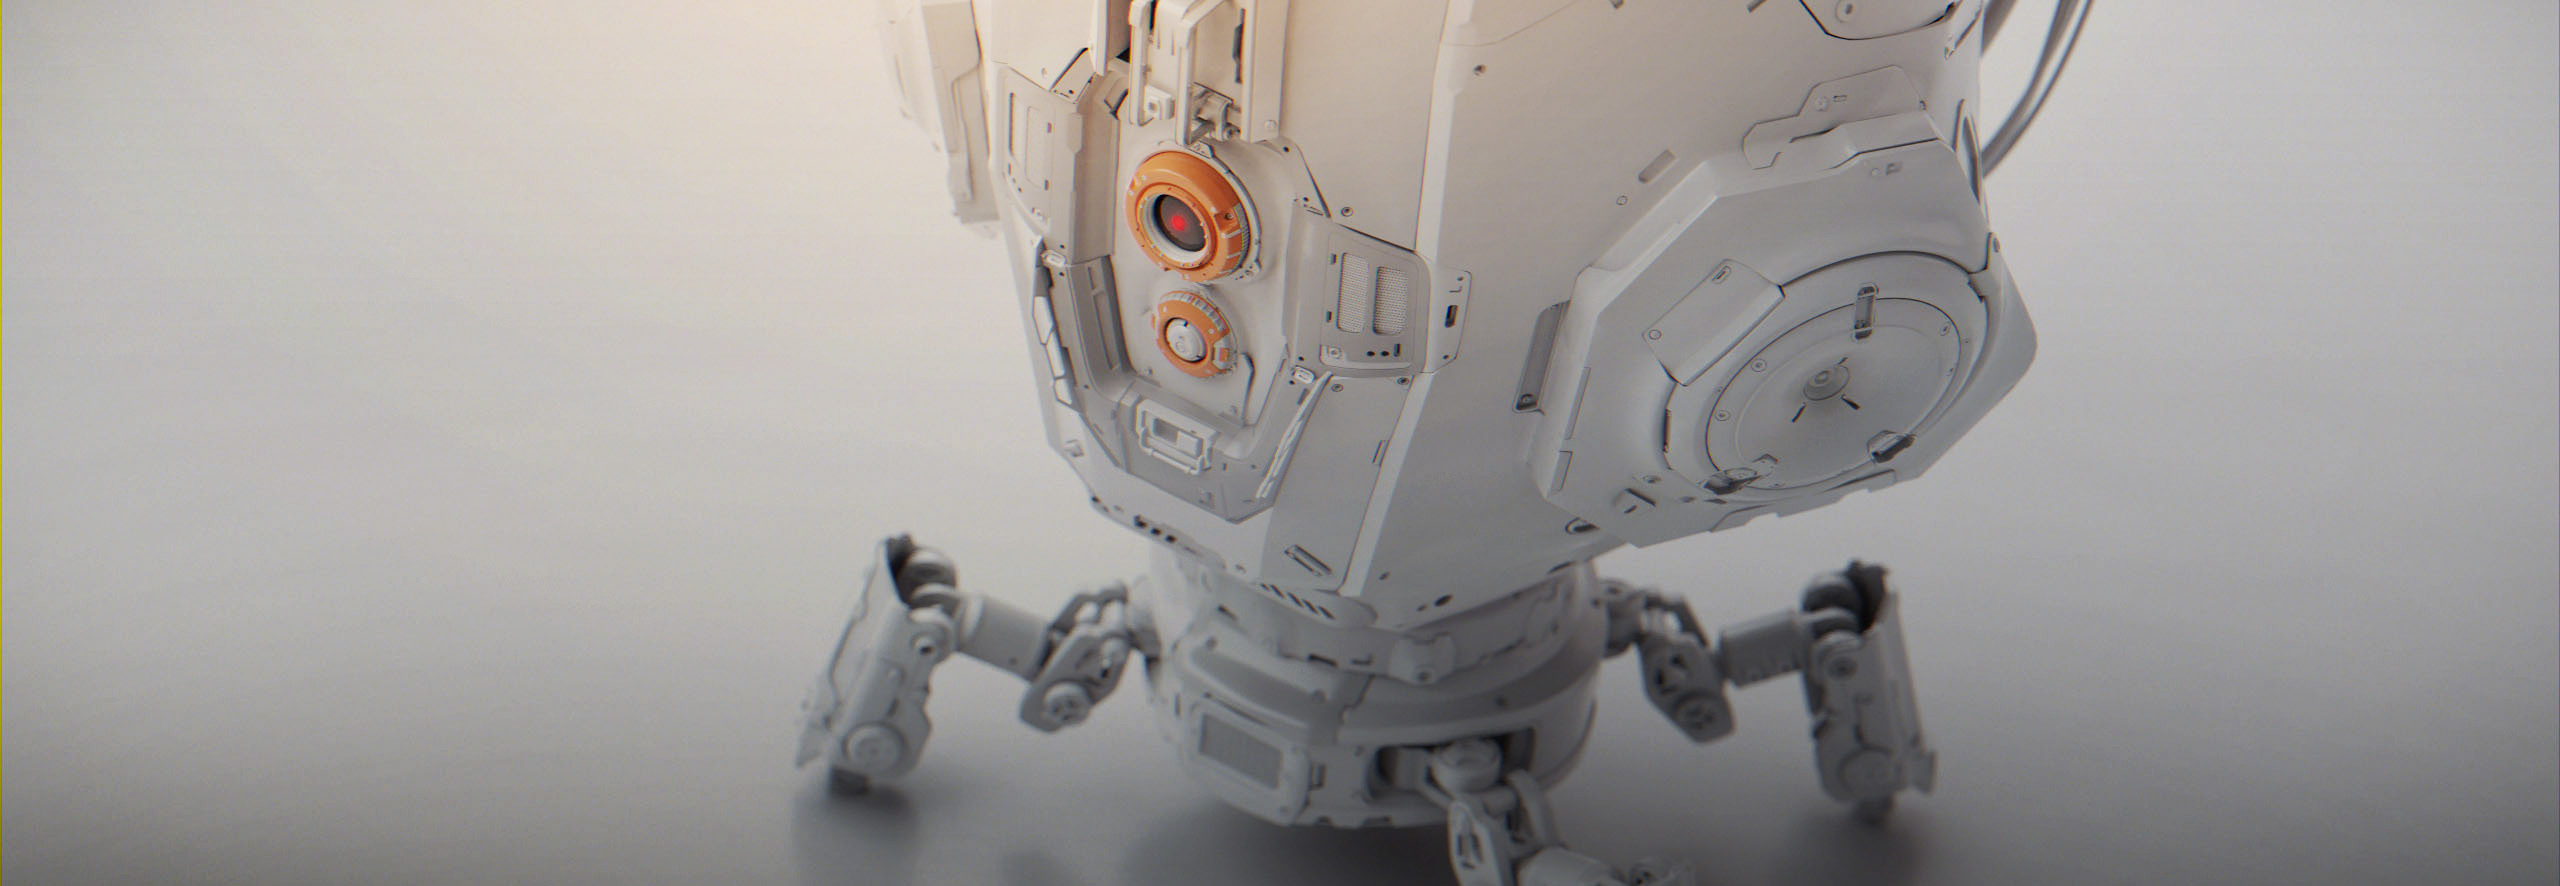 Creative Shrimp • CG Tutorials, art and coffee for 3D Artists